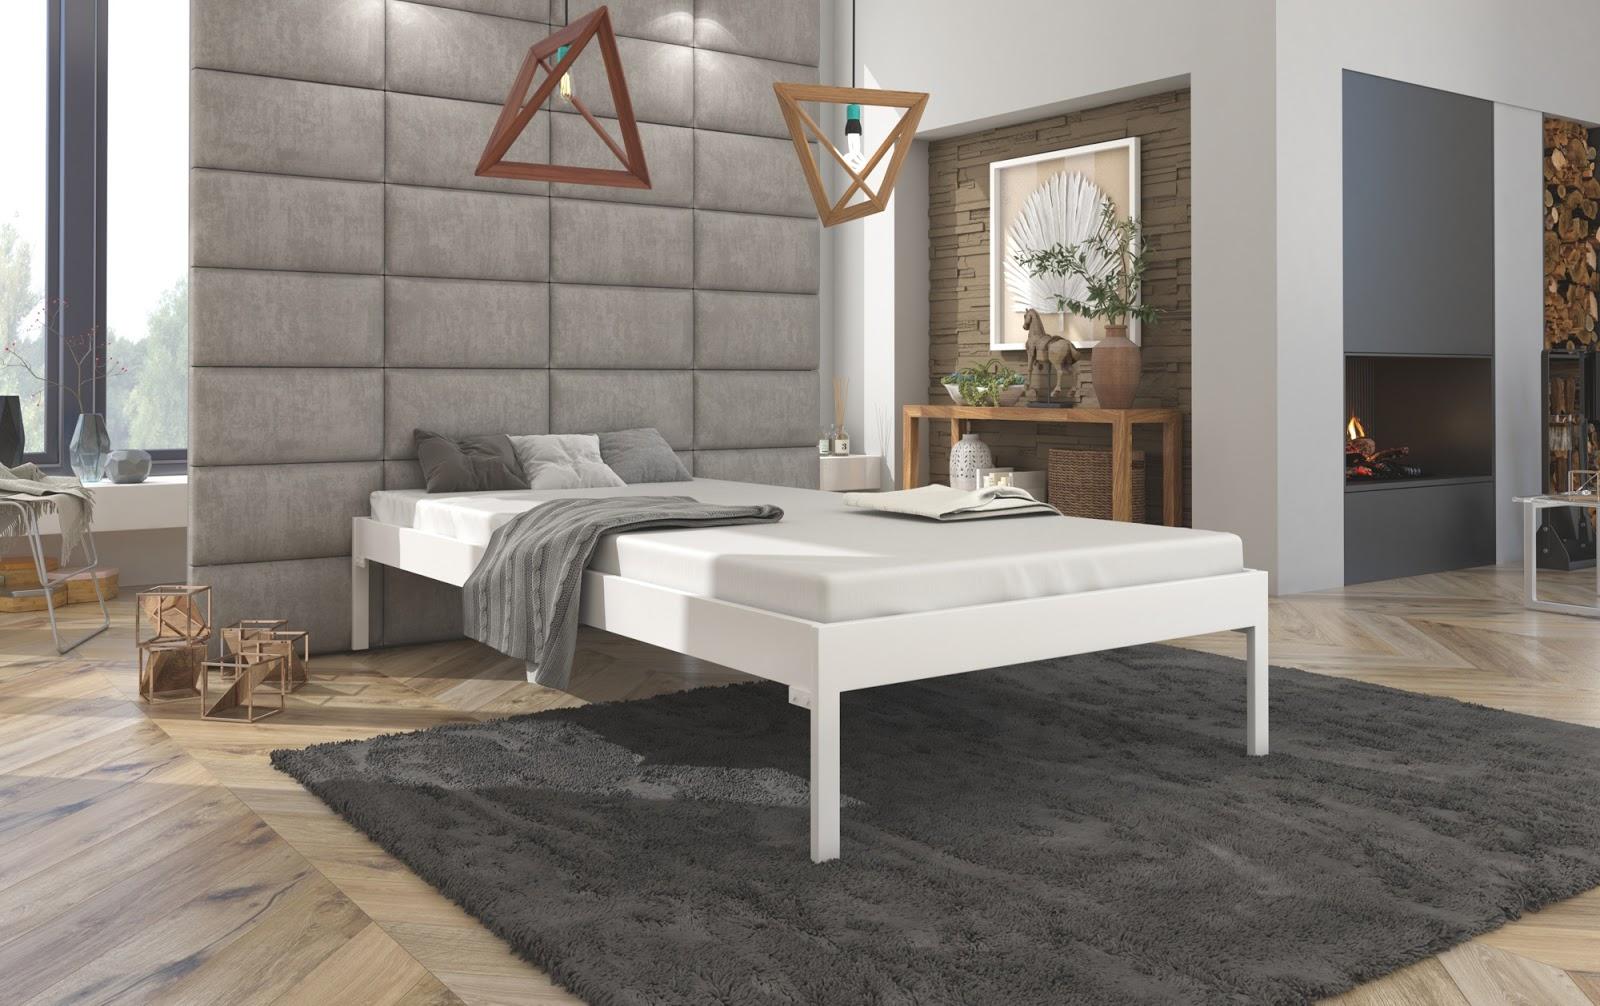 Łóżko metalowe wzór 40